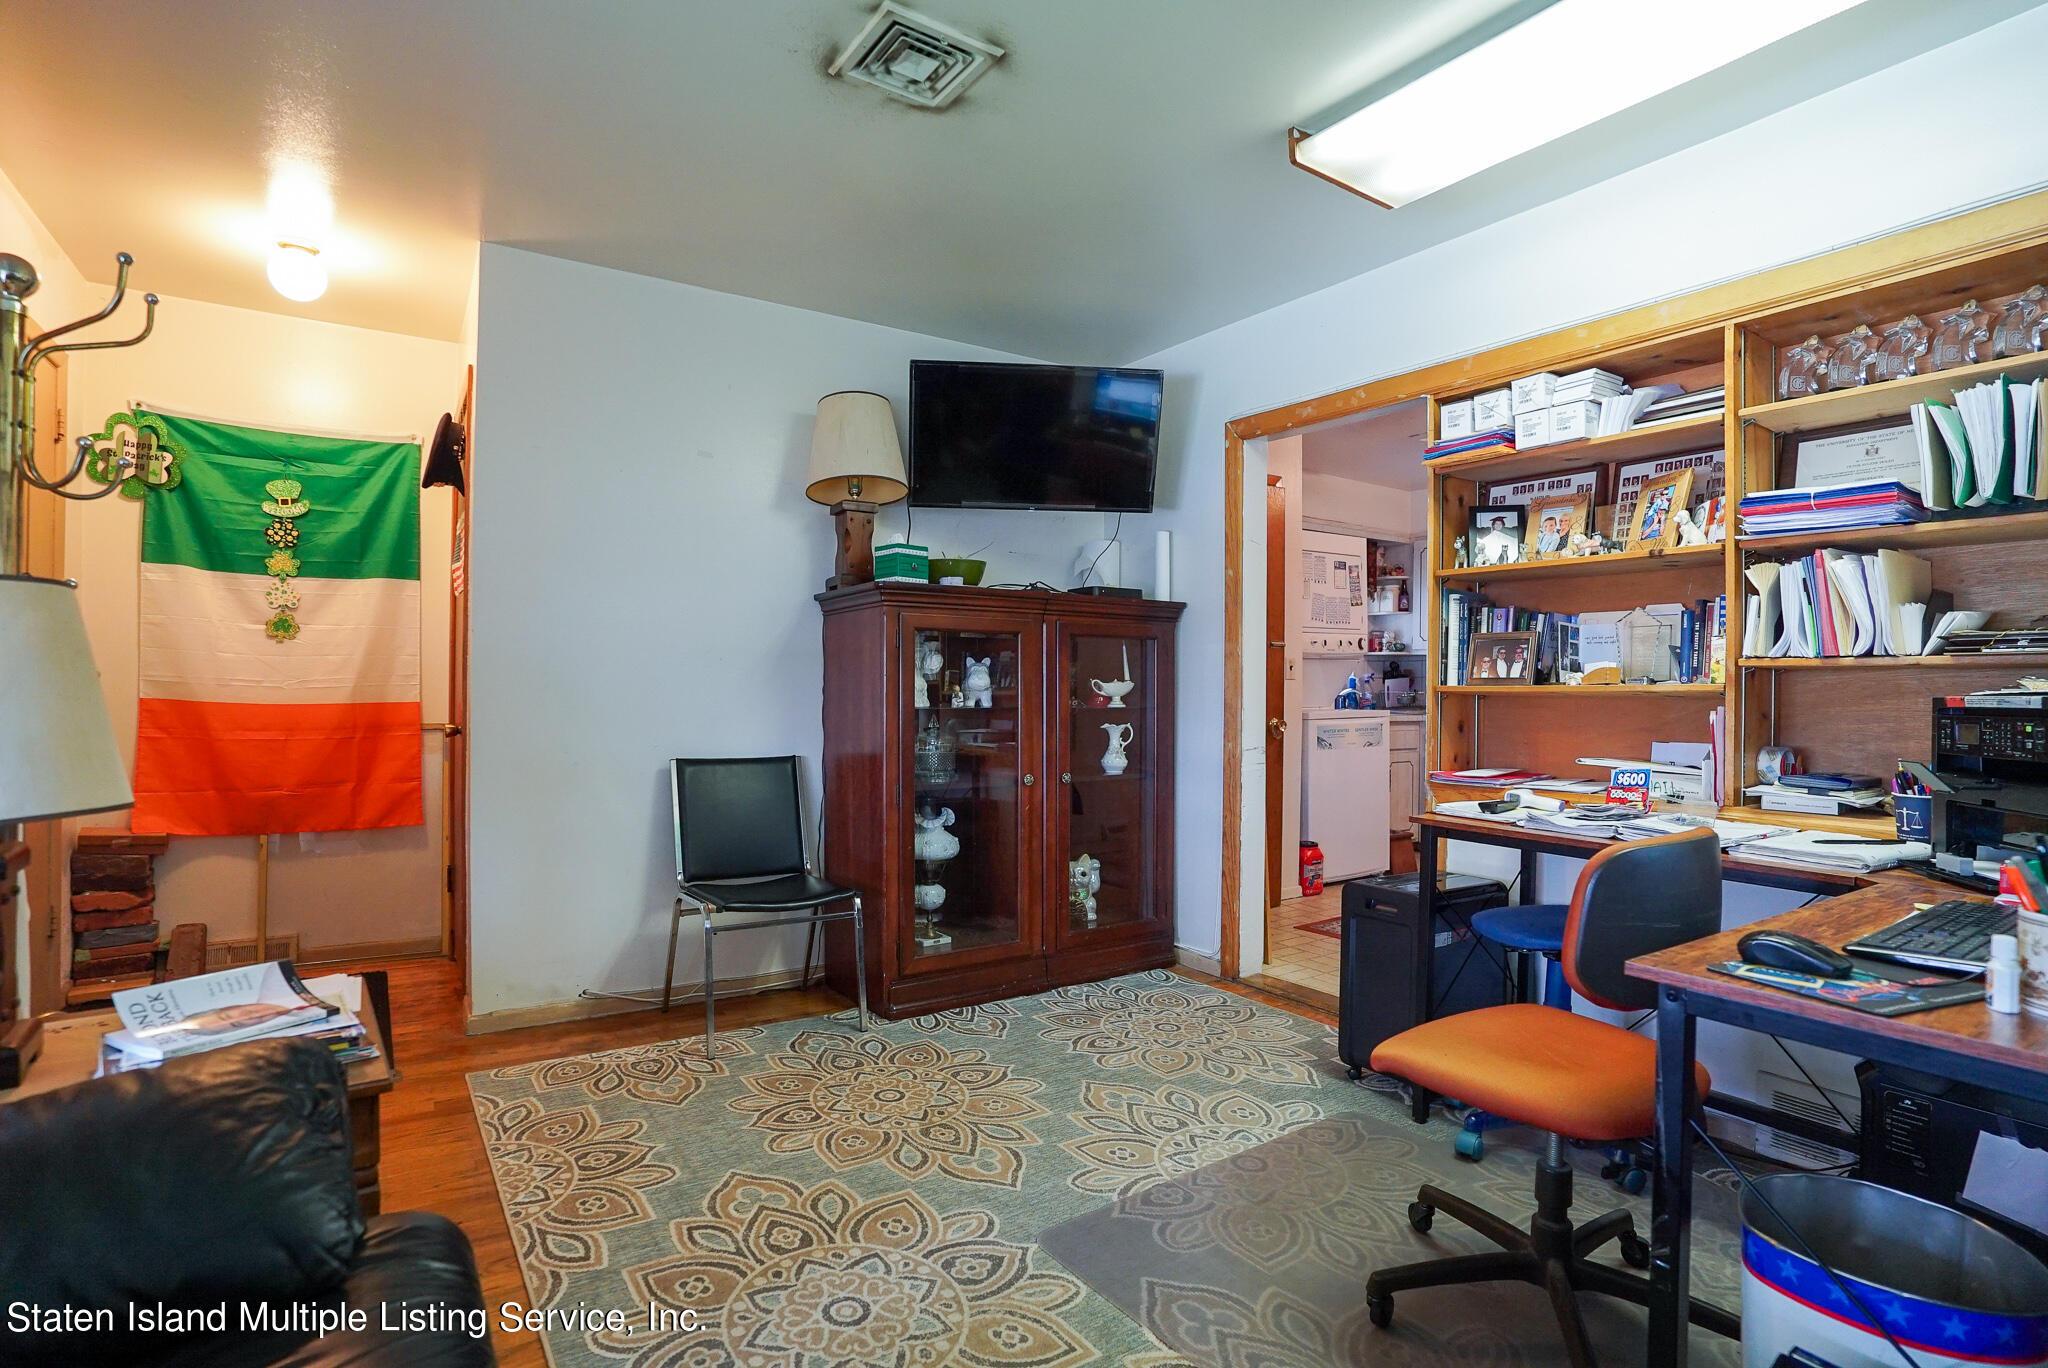 Single Family - Detached 121 Parkinson Avenue  Staten Island, NY 10305, MLS-1147747-6